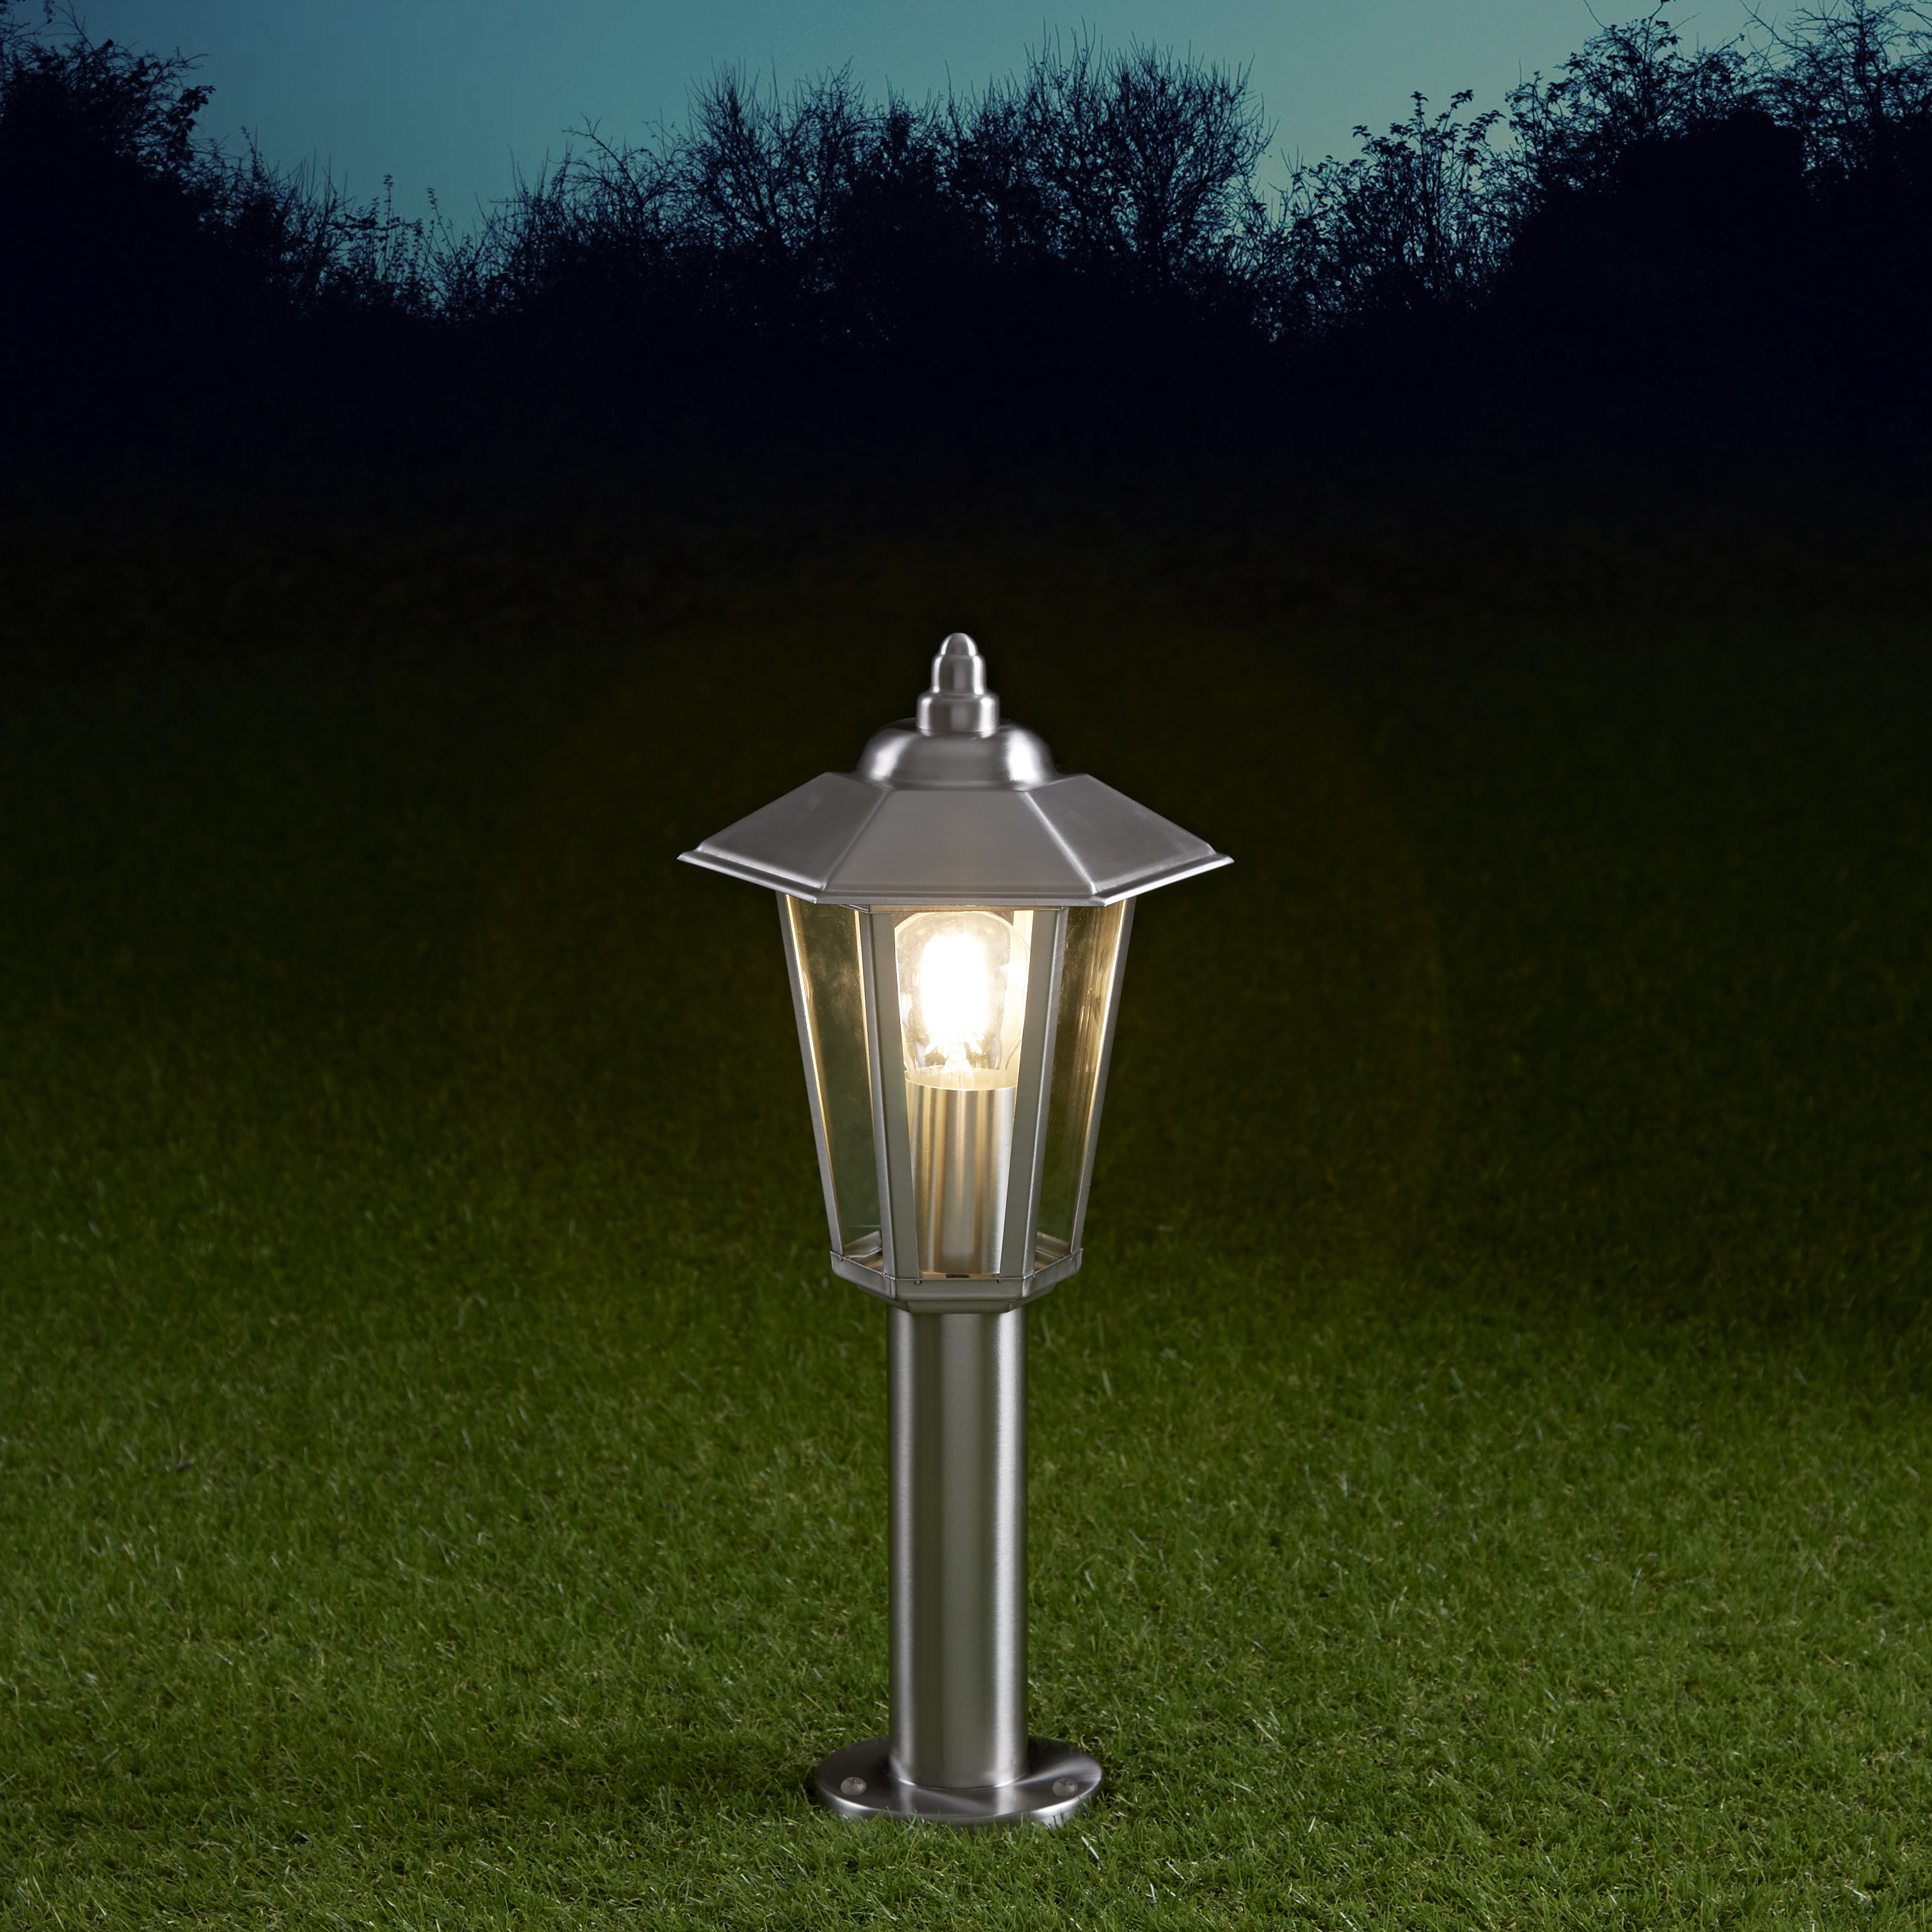 Cannes Dimbare Sokkellamp 45cm RVS E27 IP44